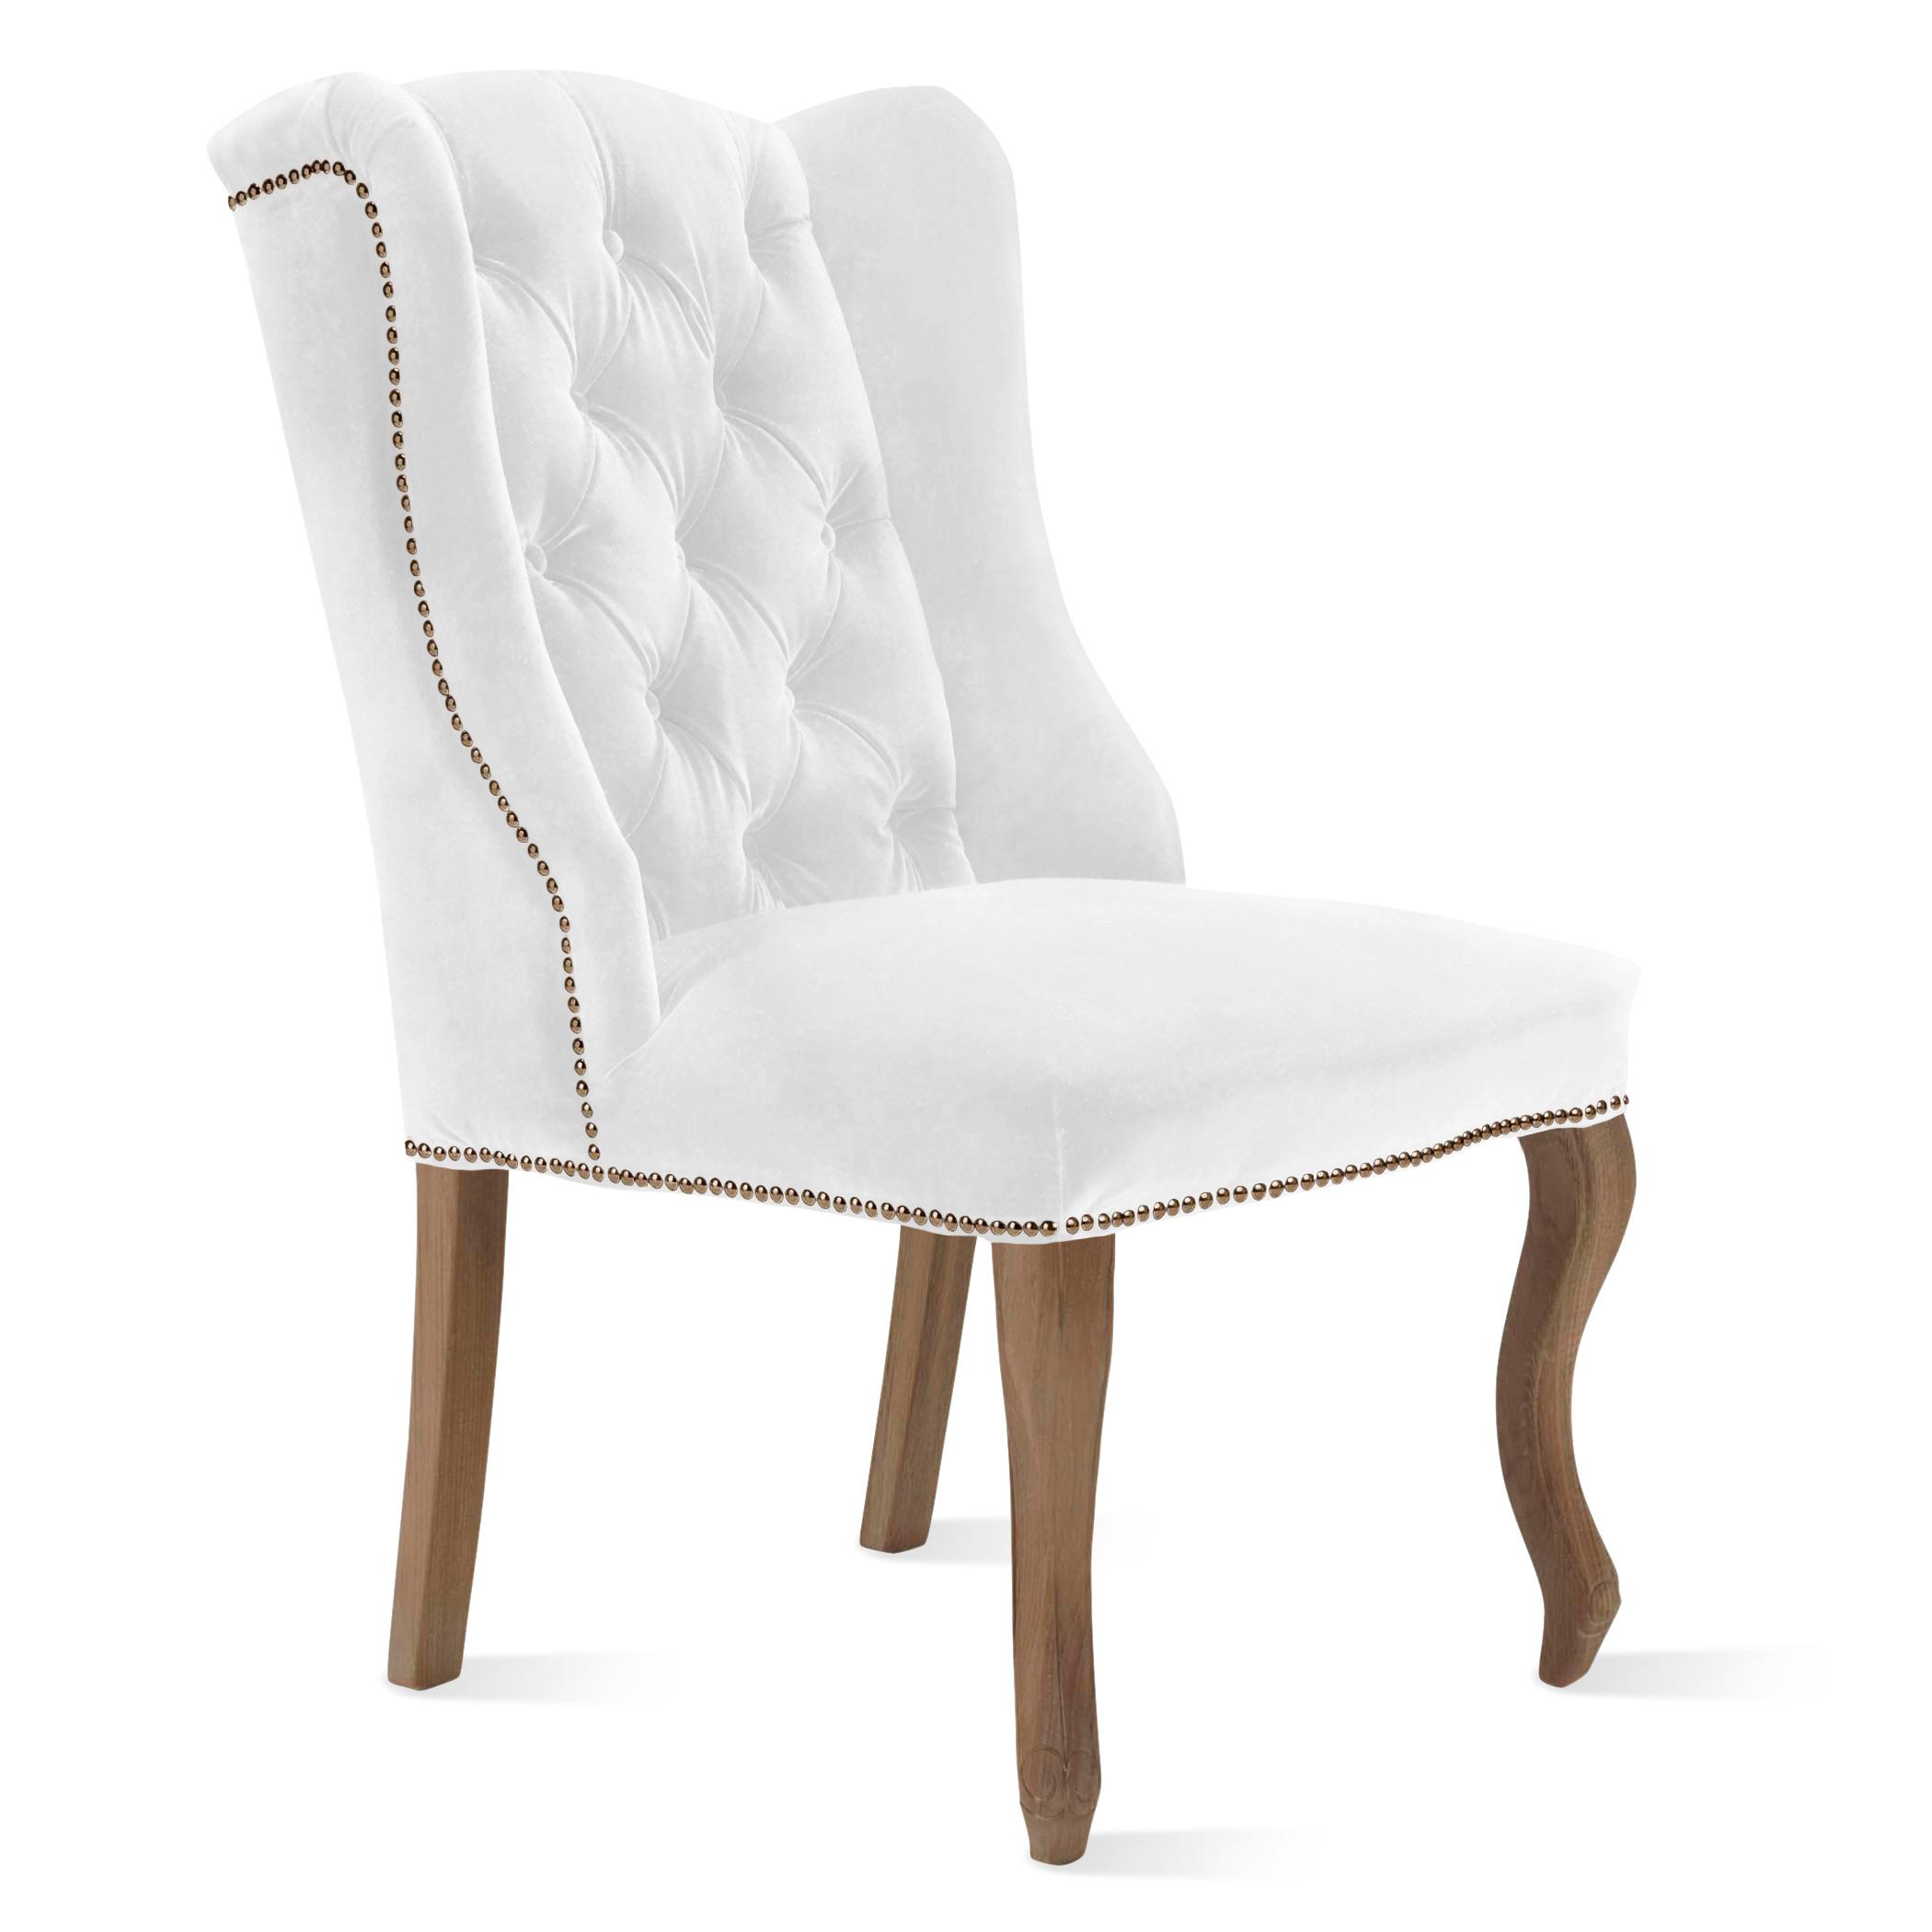 Archer Dining Chair - Wash Oak